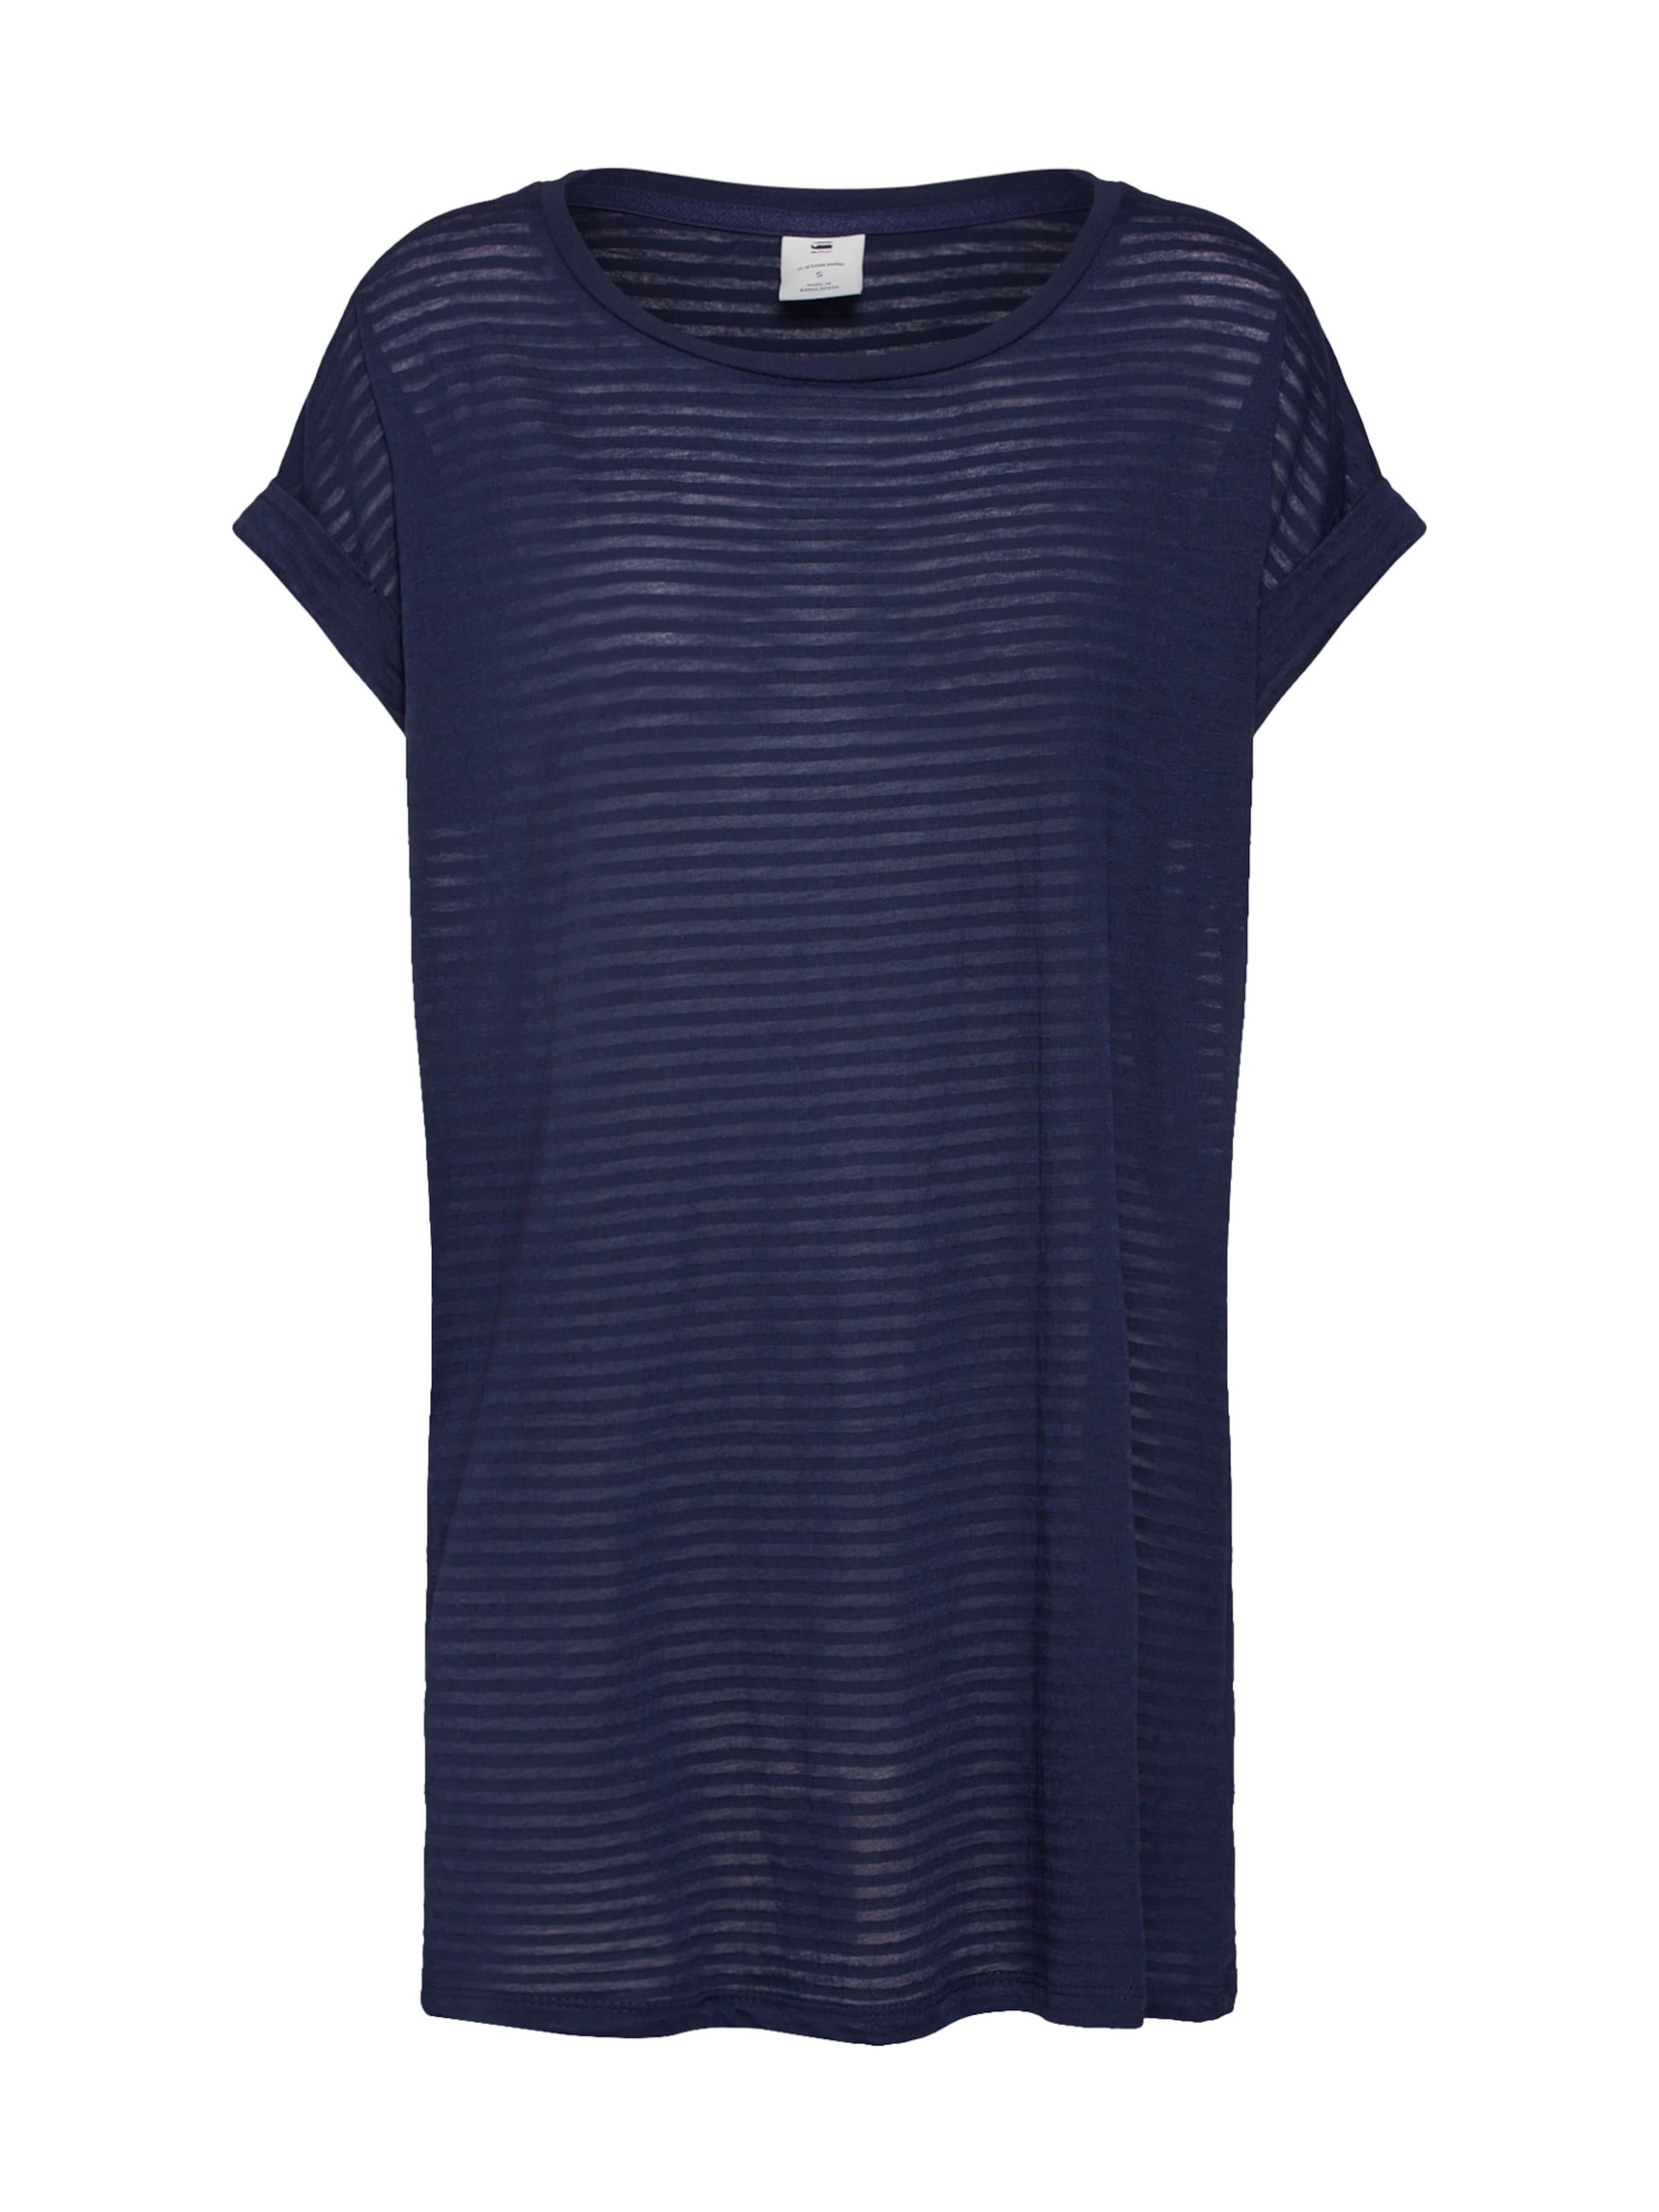 'luge' star Bleu Raw T shirt G En 2E9DHI